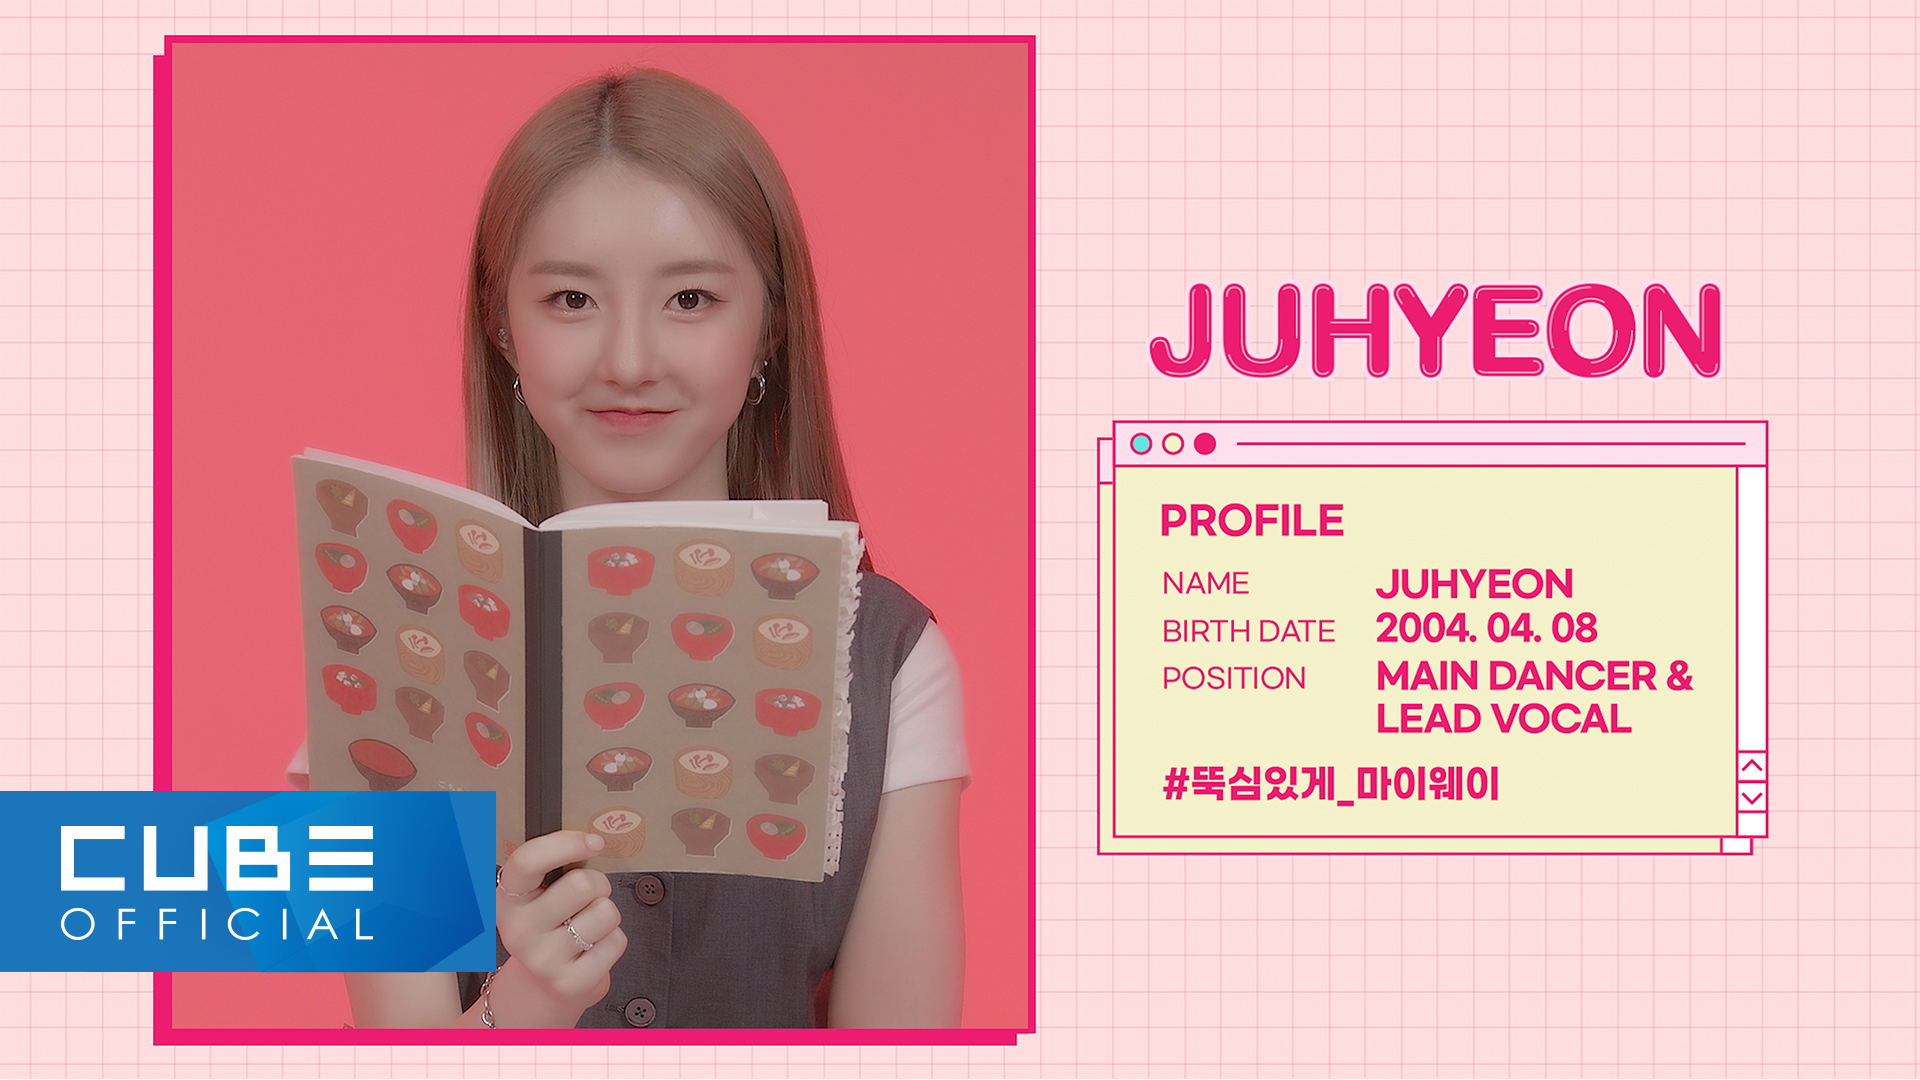 LIGHTSUM - PR INTERVIEW 'In My Life' : 주현 JUHYEON